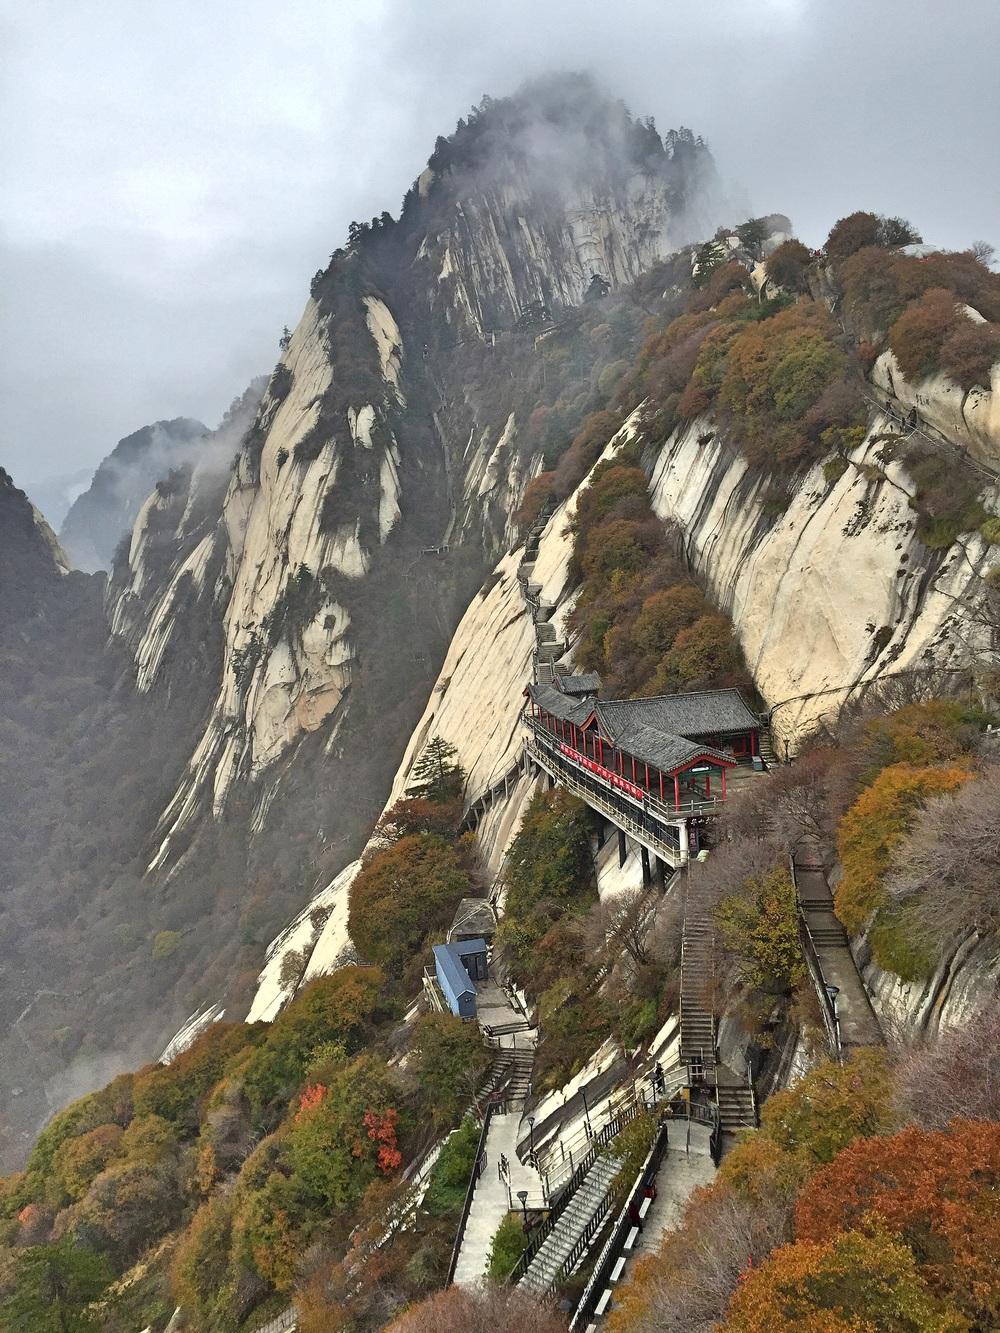 Cliffside Monastery, Huashan, China